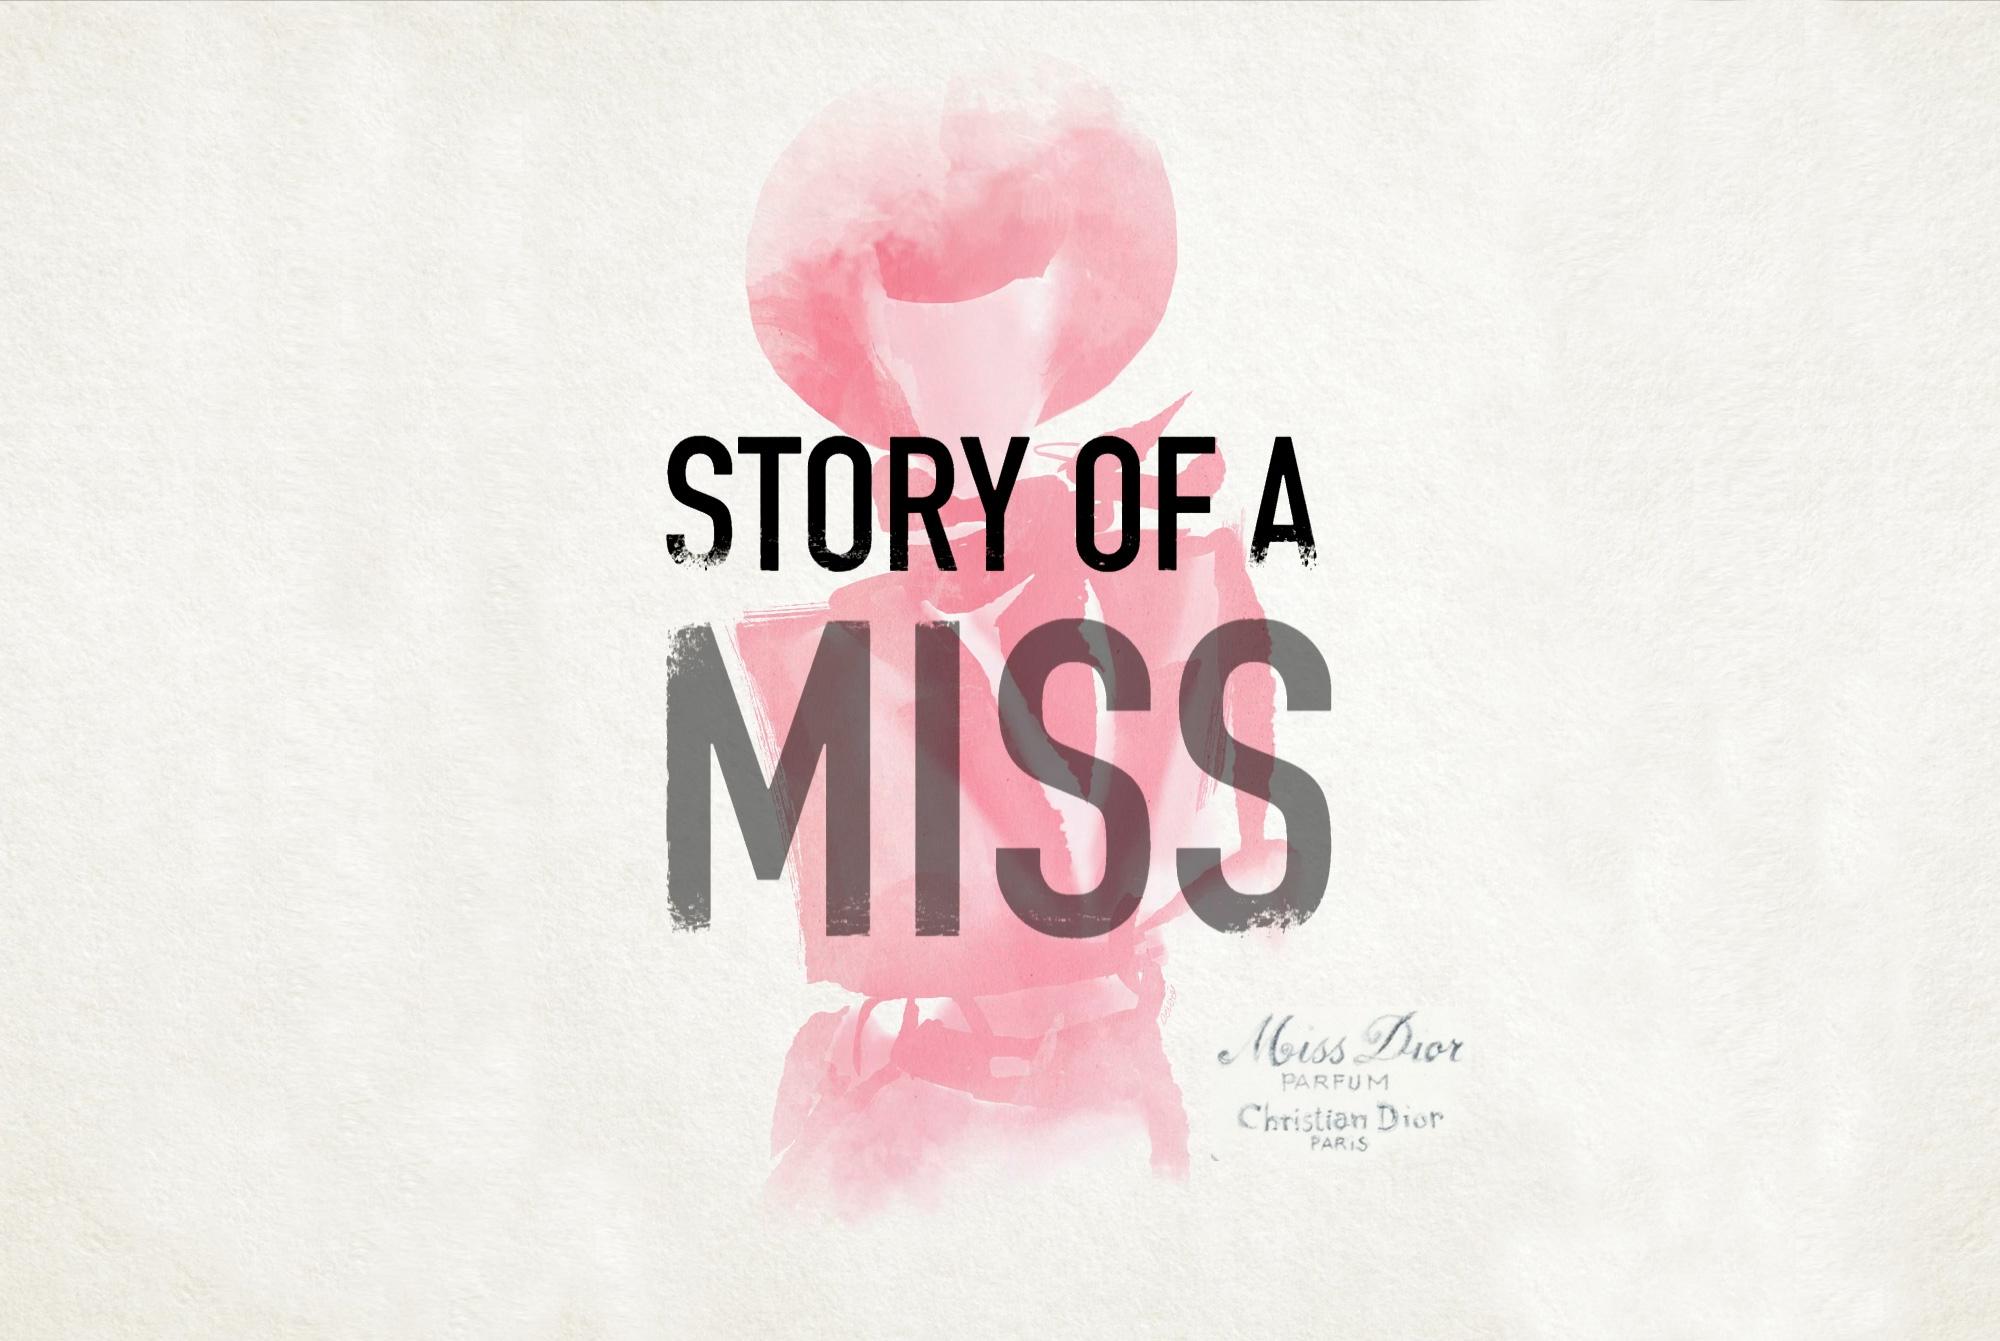 Miss Dior - Aquarelle